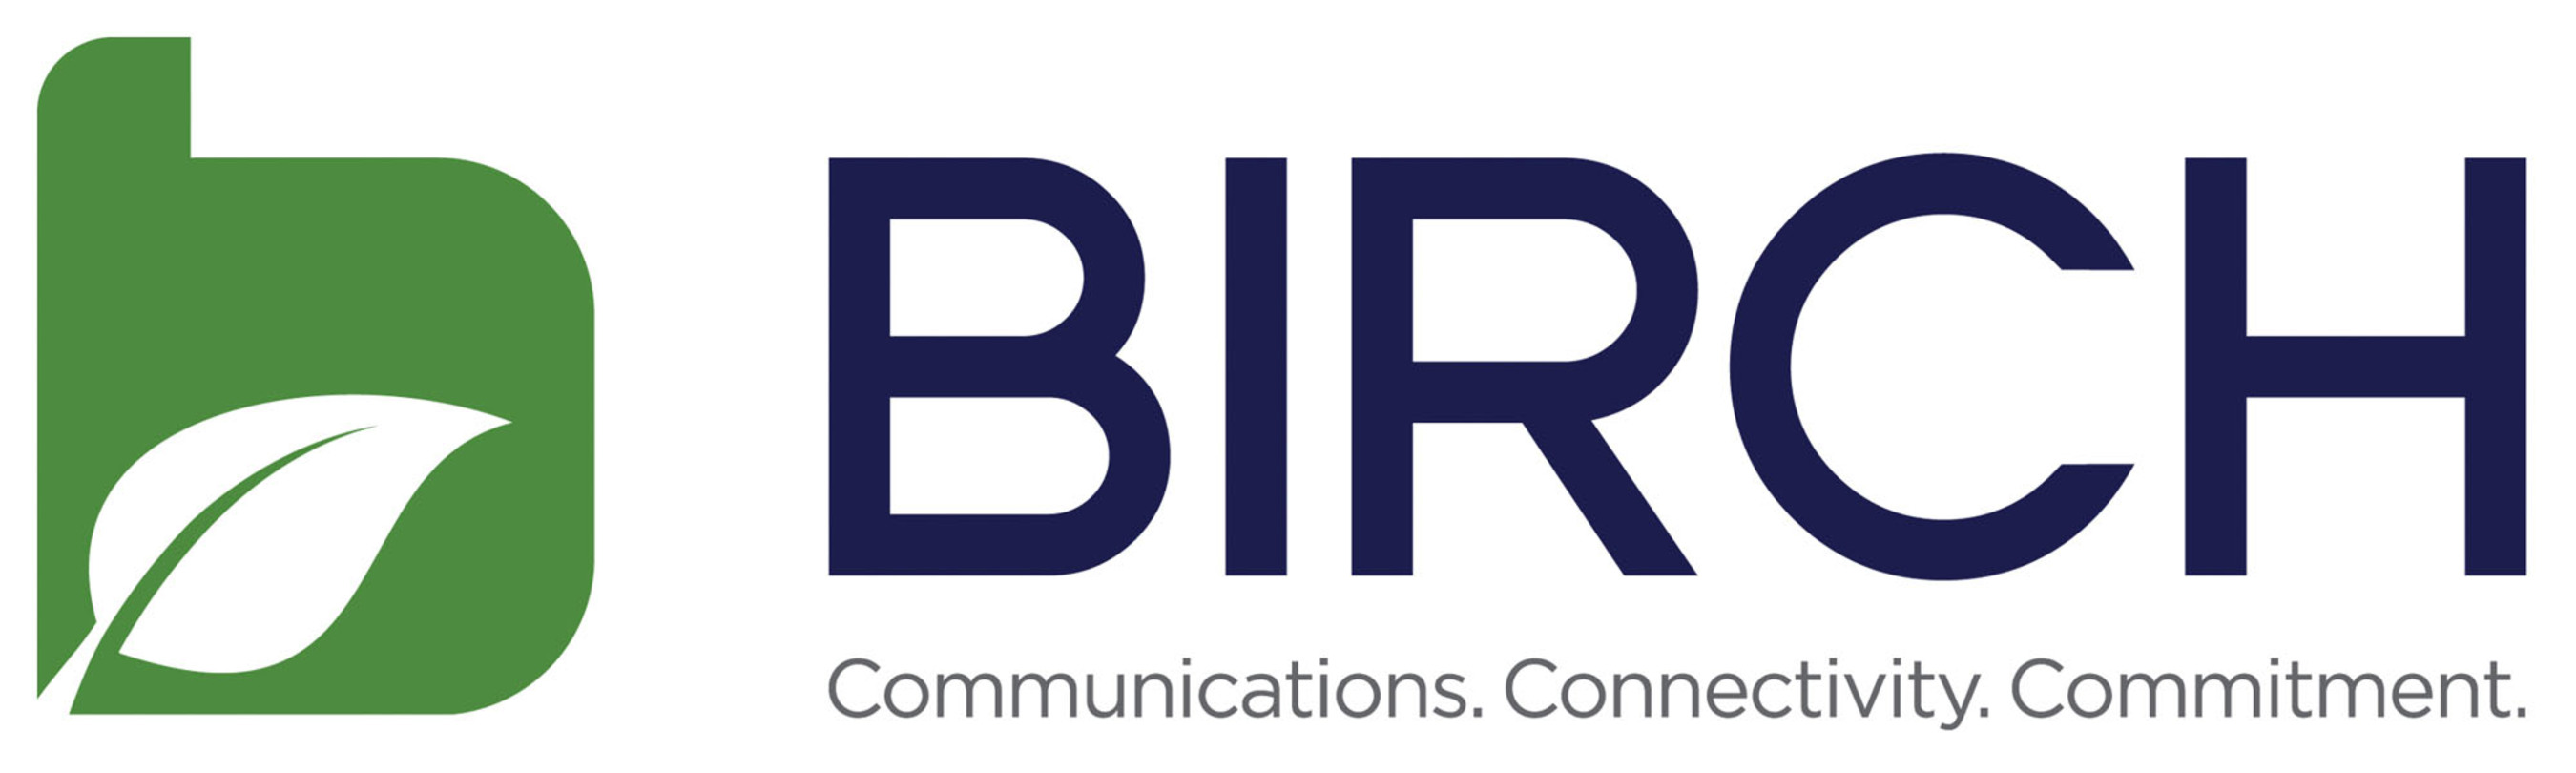 Birch Communications